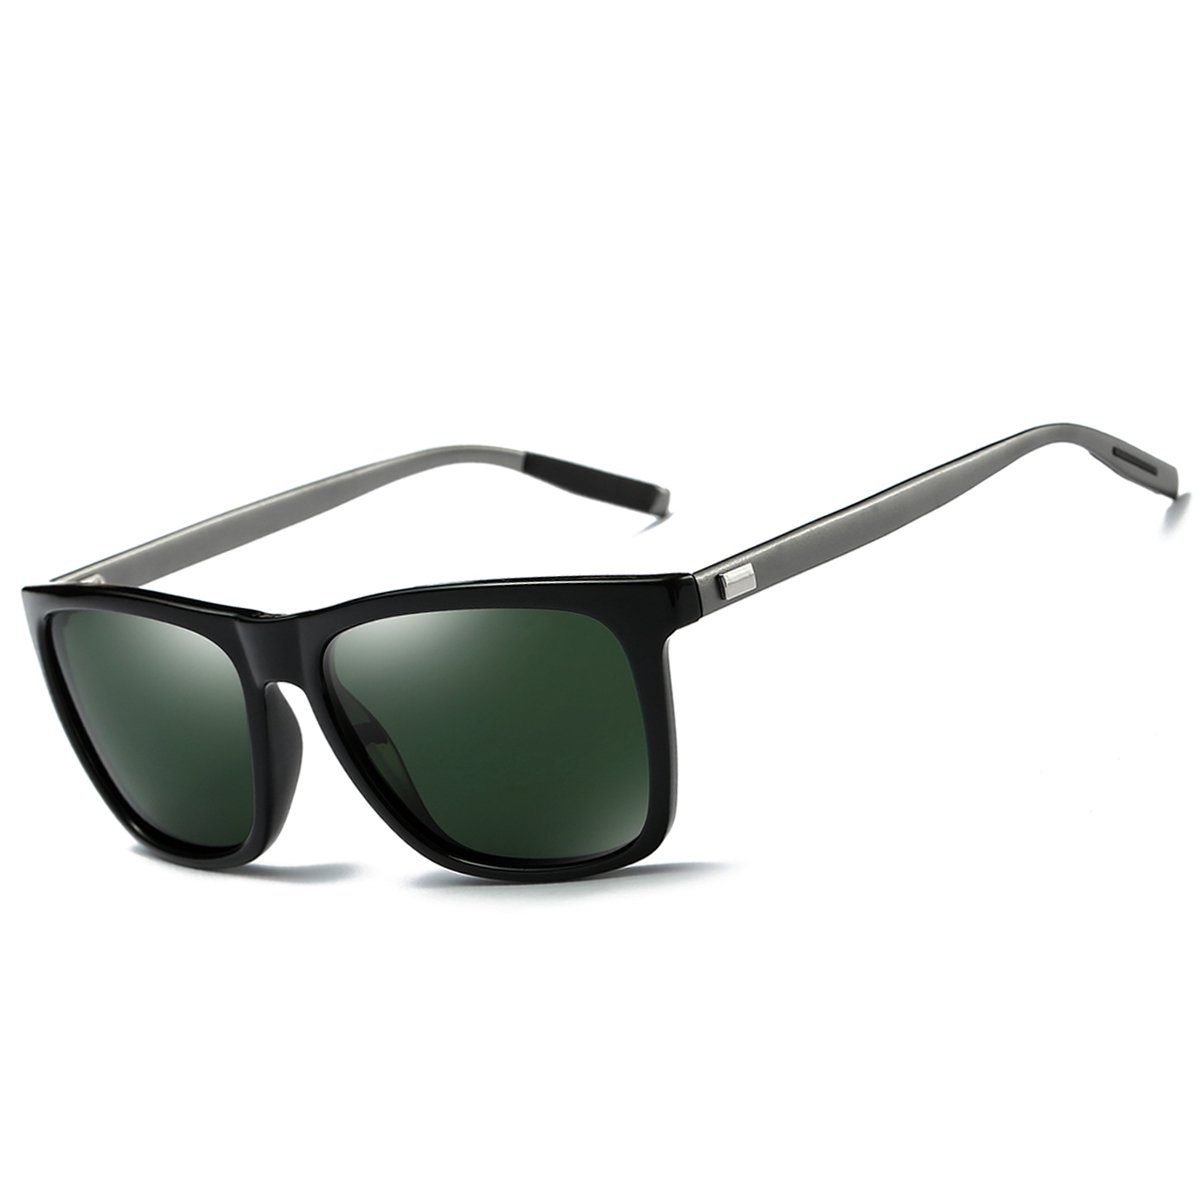 FEIDU Polarized Wayfarer Sonnenbrille für Herren FD9003 (Grun, 2.24 ...